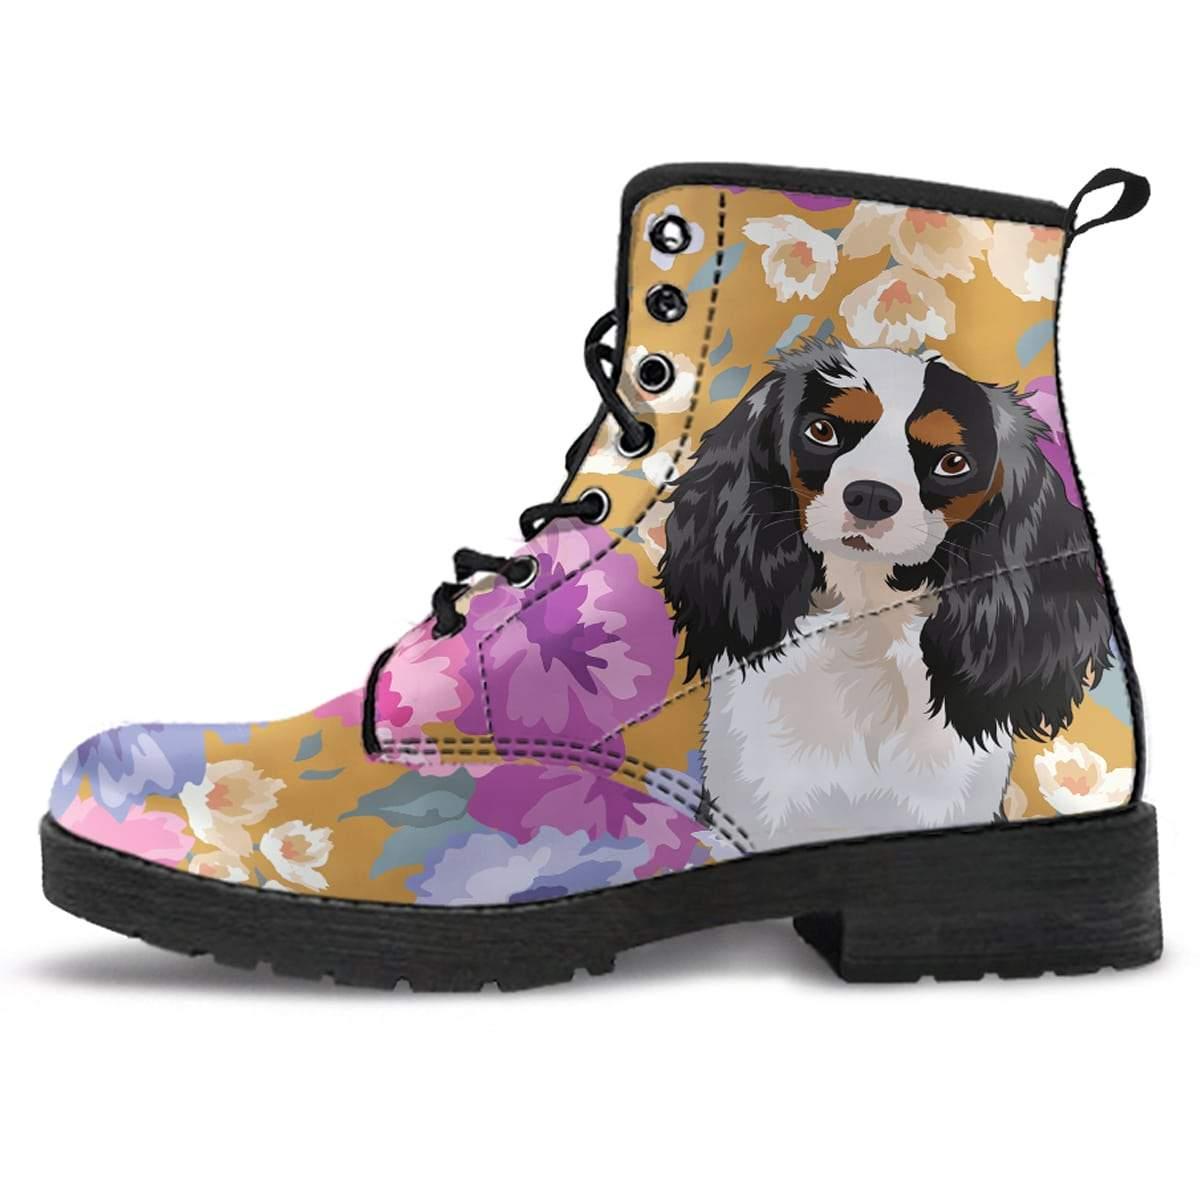 King Charles Spaniel Dog Portrait Boots   King charles